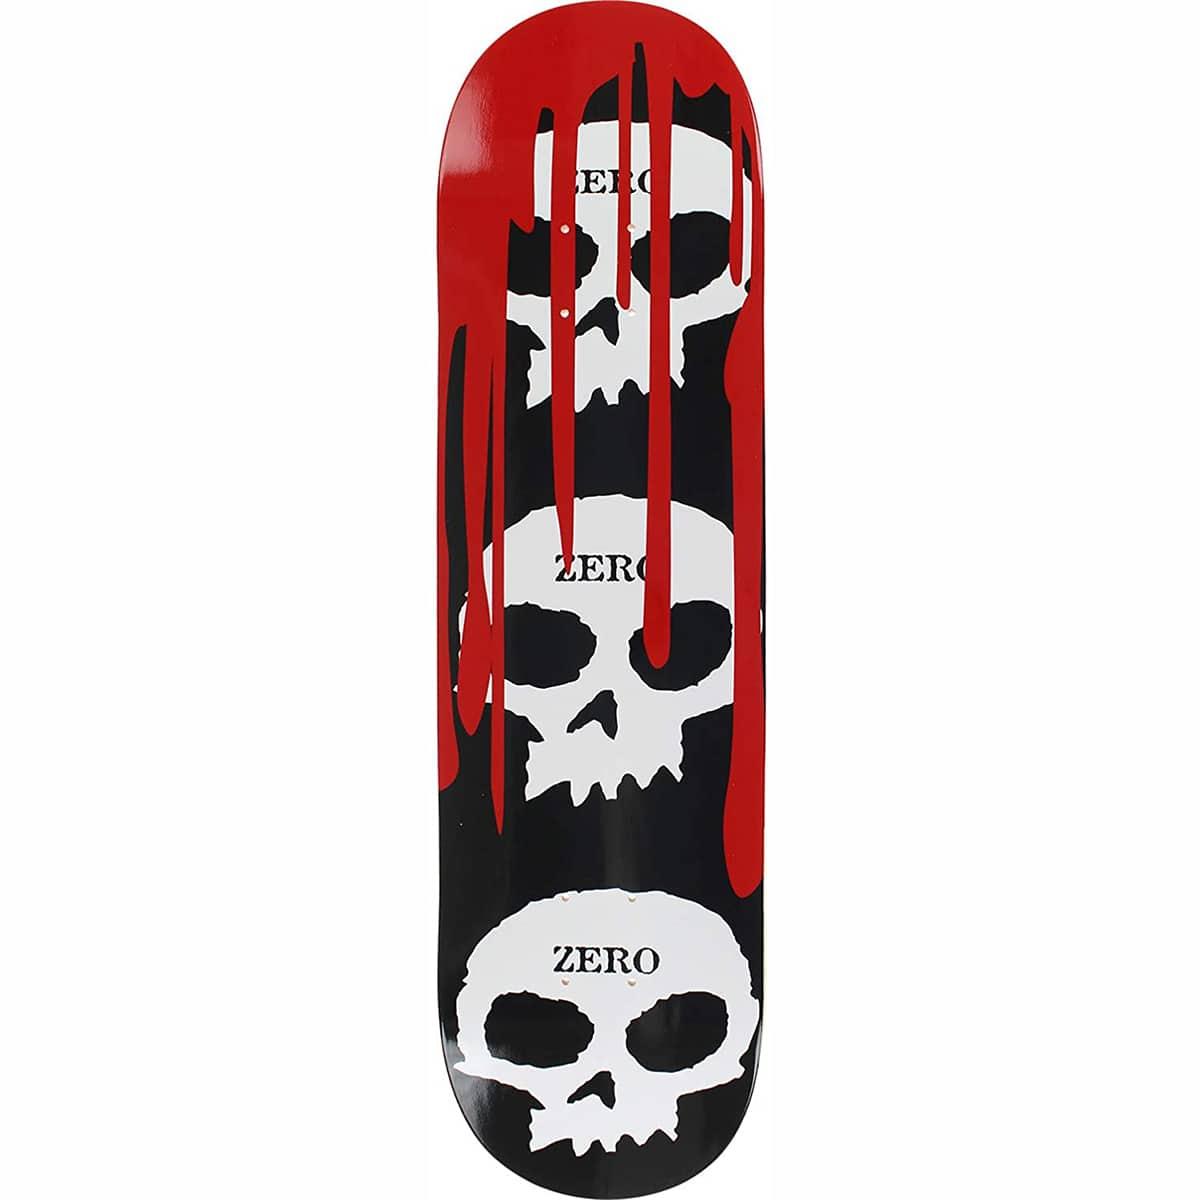 Planche de skateboard Zero 3 Skull Blood Black White Red deck 7.75″